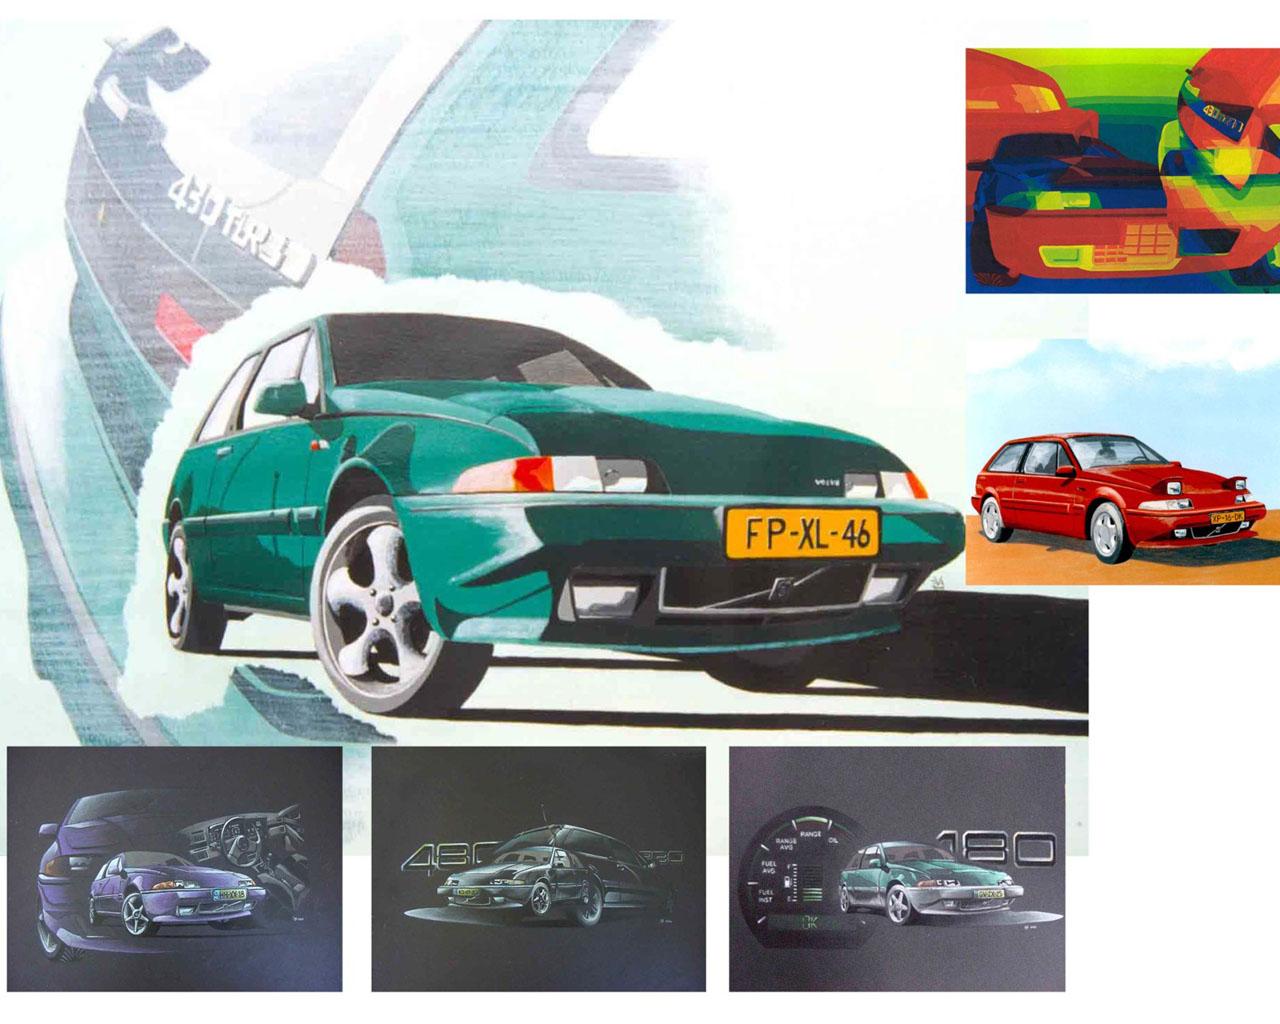 Volvo 480 Downloads | Volvo 480 Turbo Wiring Diagram |  | Volvo 480 Club Europe